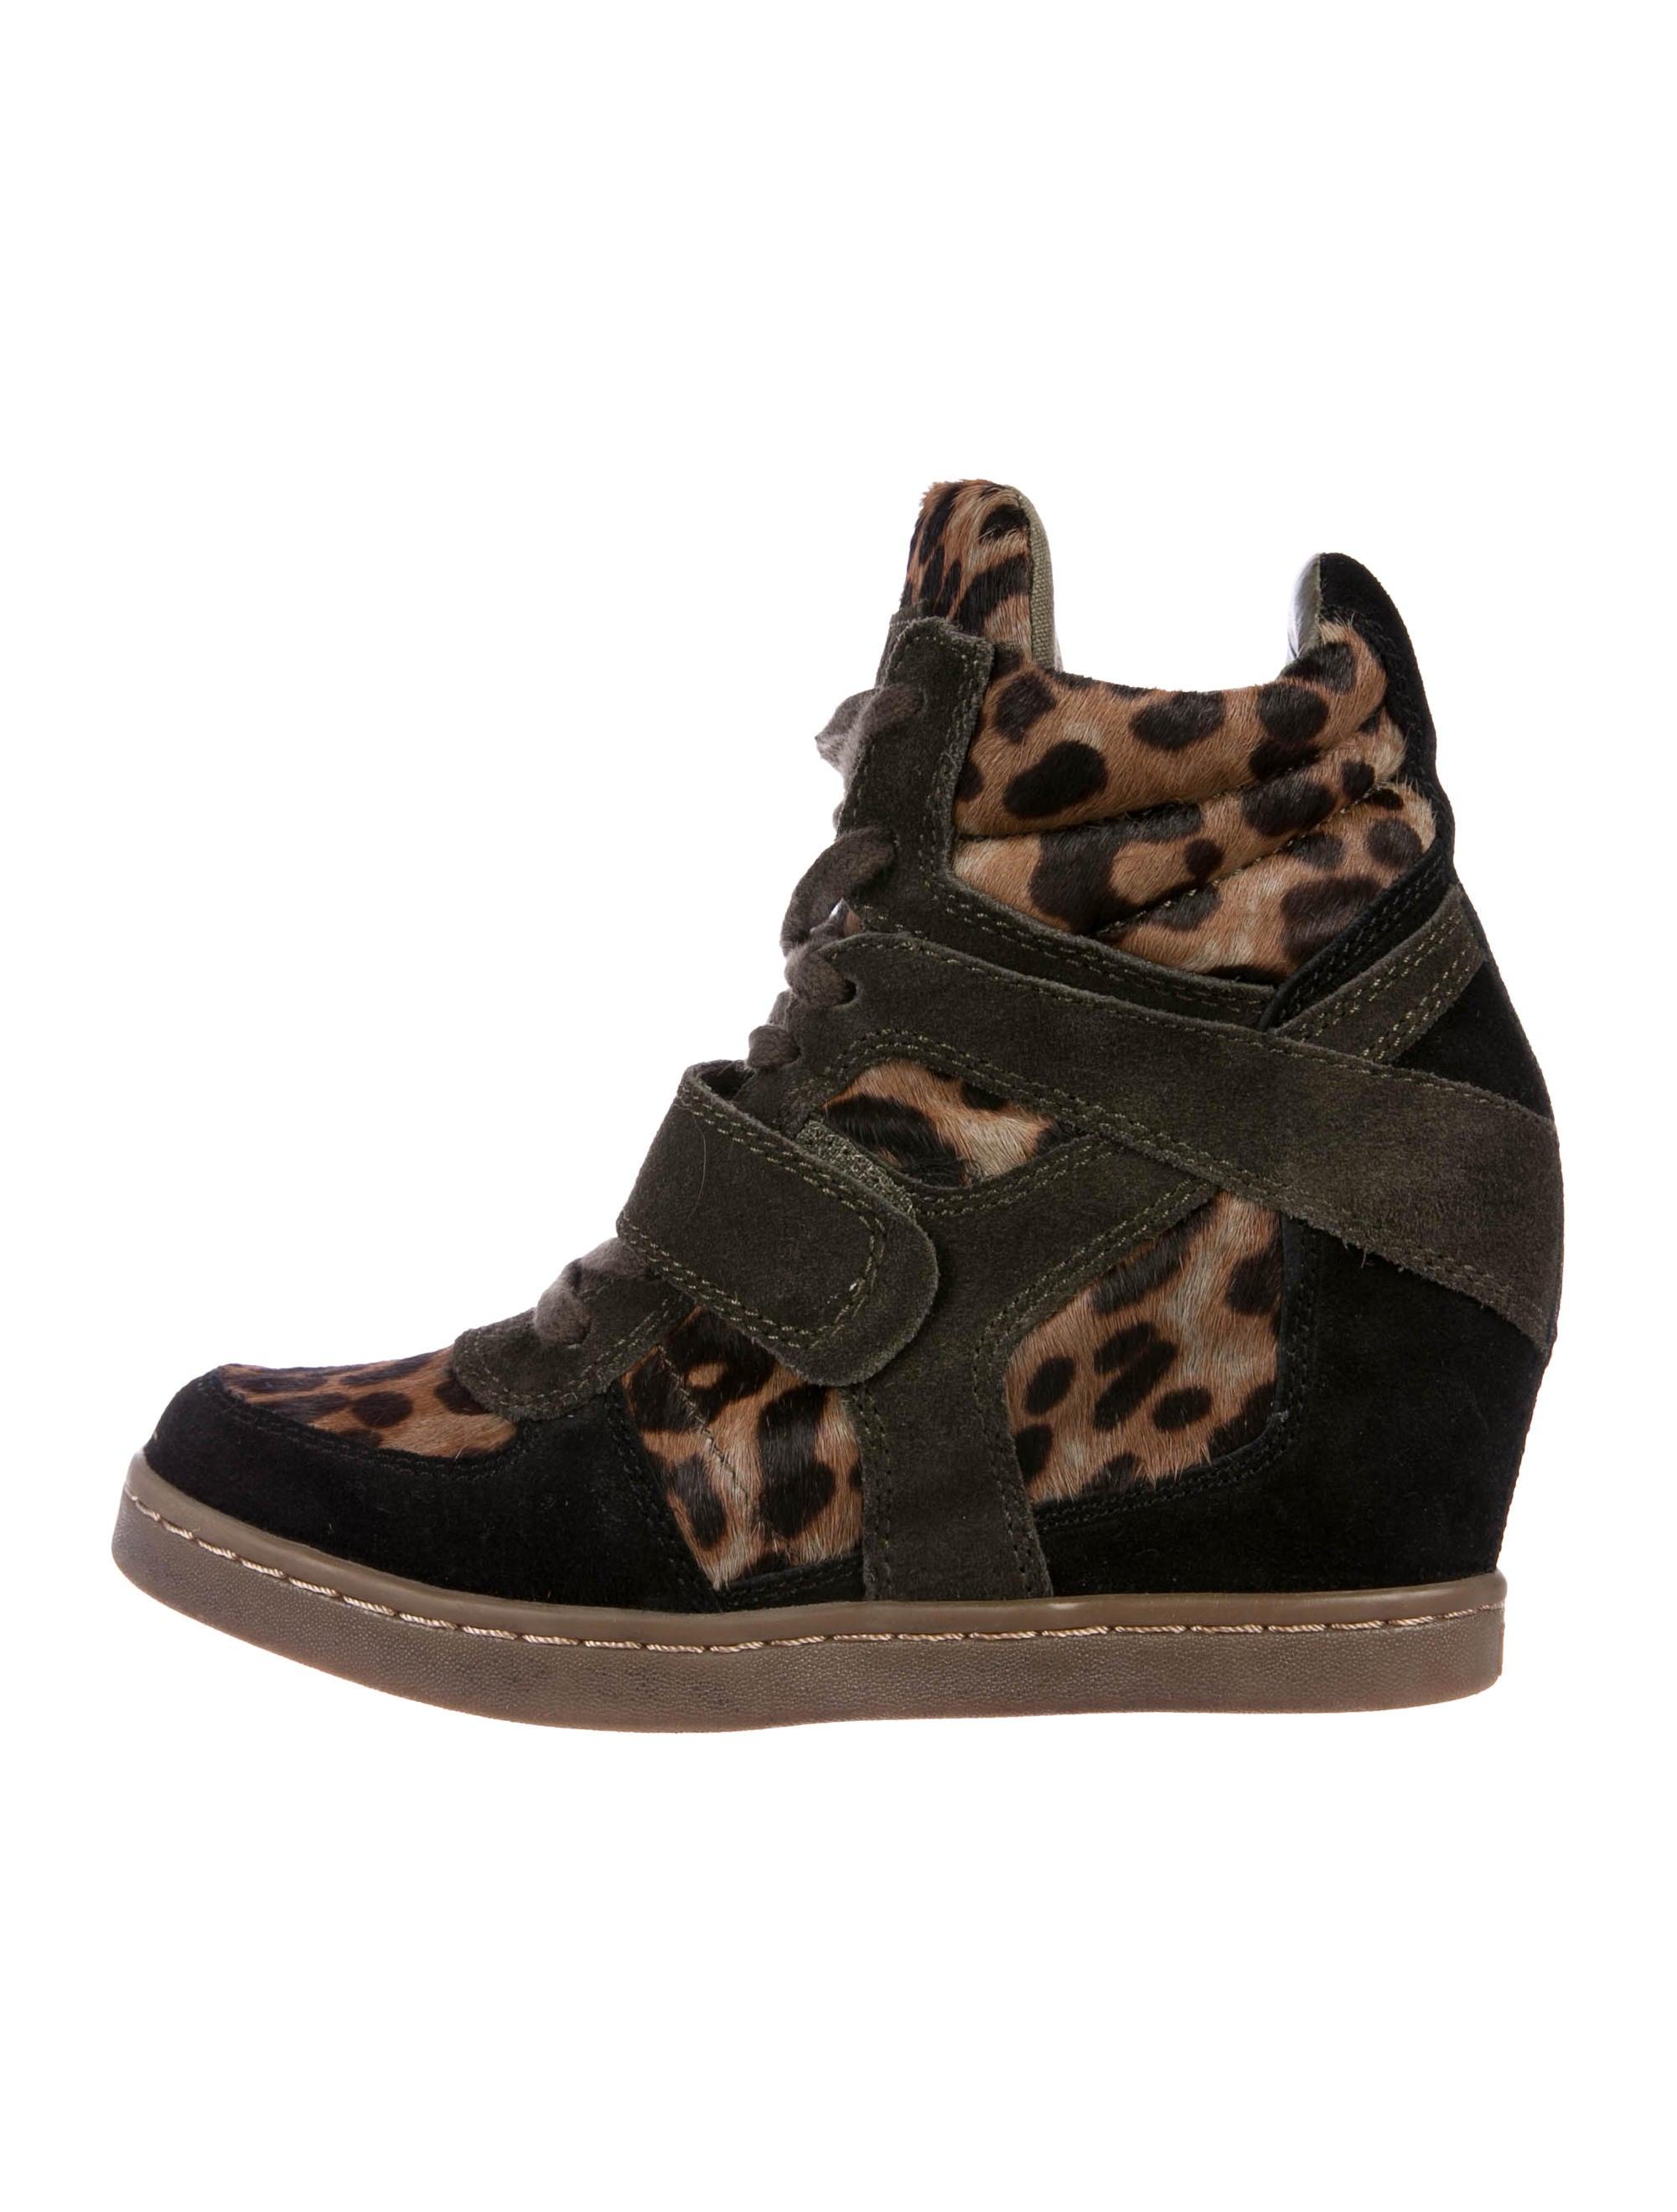 fc8928849b4a Ash Bonno Wedge Sneakers - Shoes - WAB20461